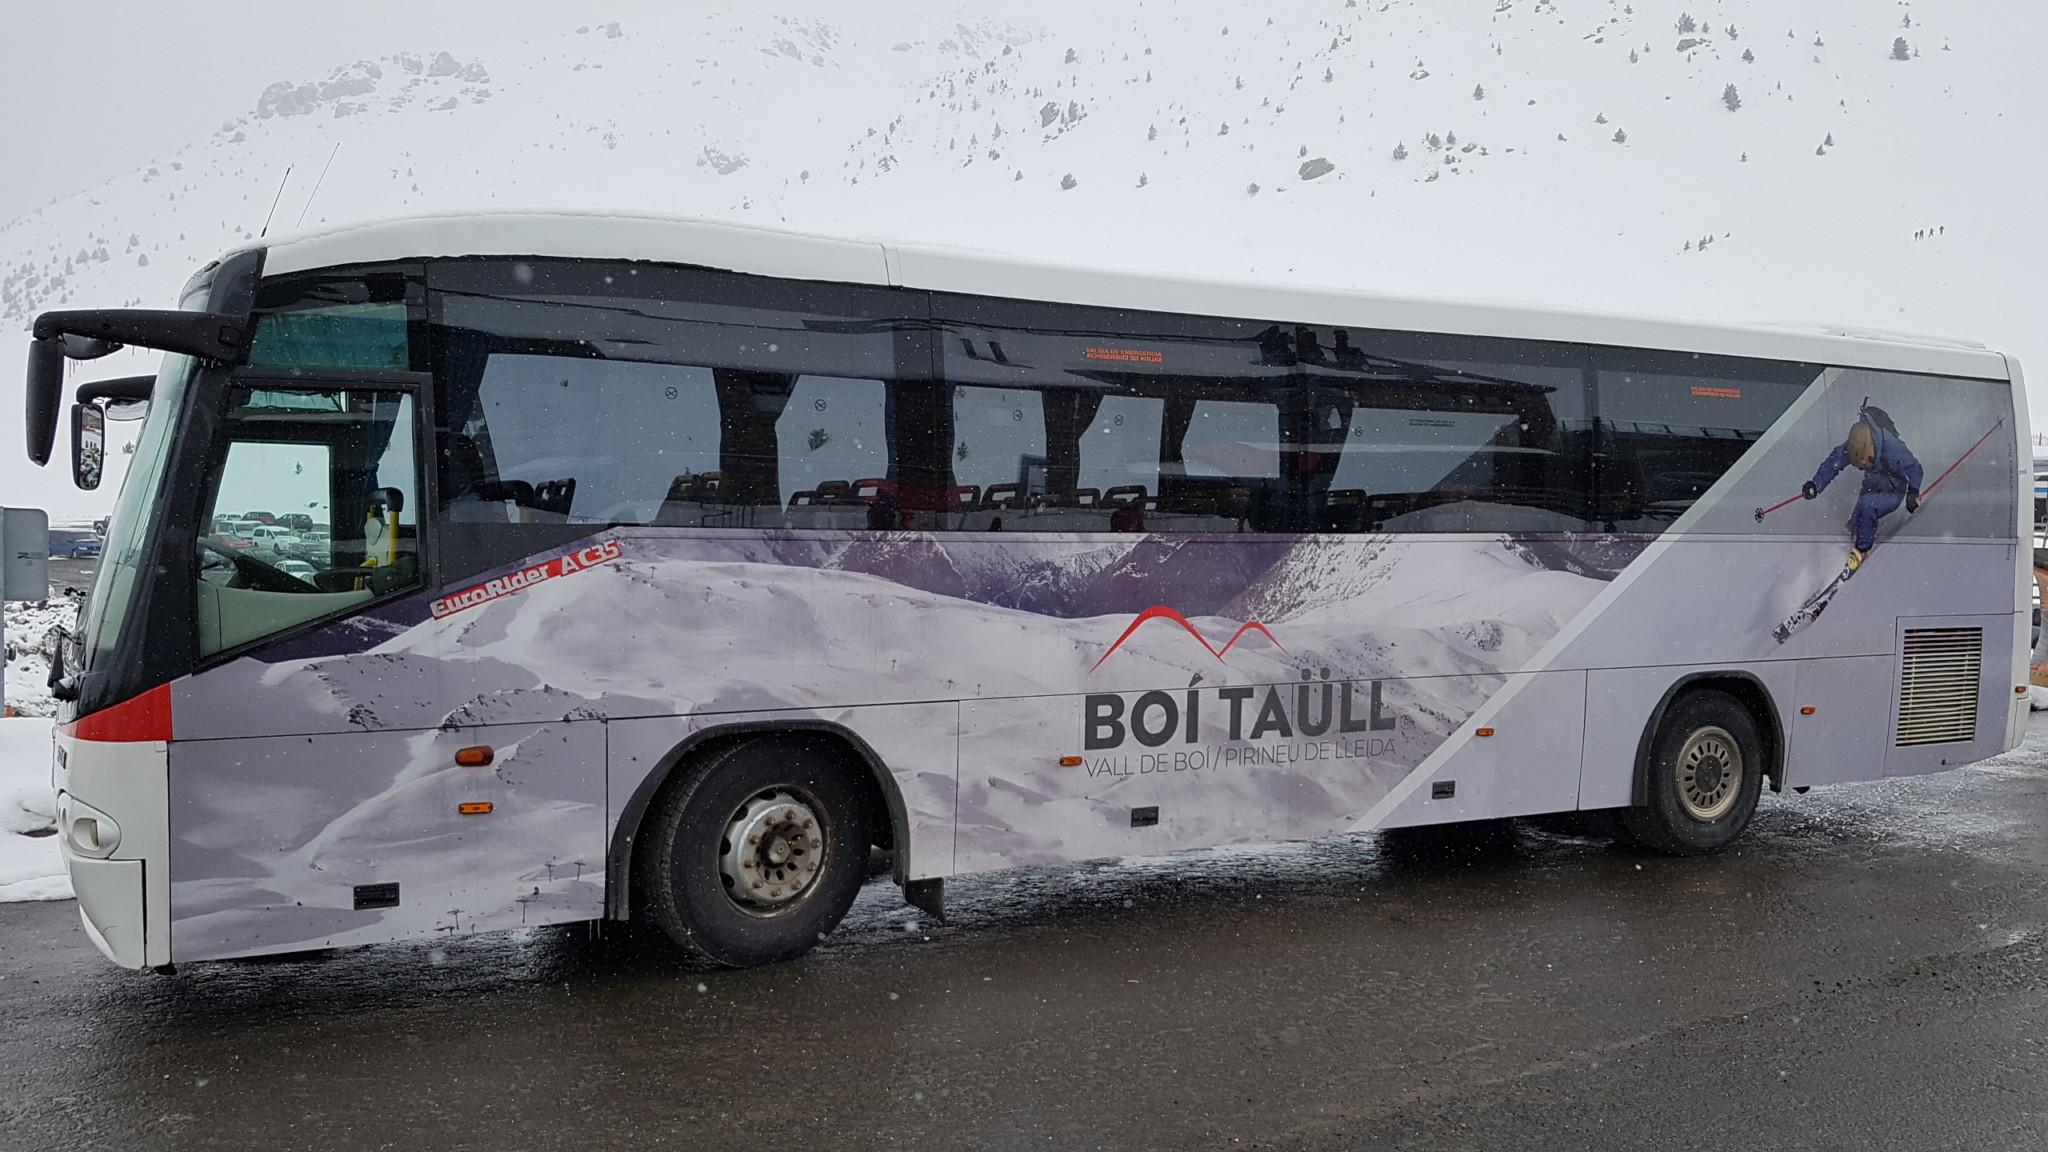 autobús gratuito boí taüll